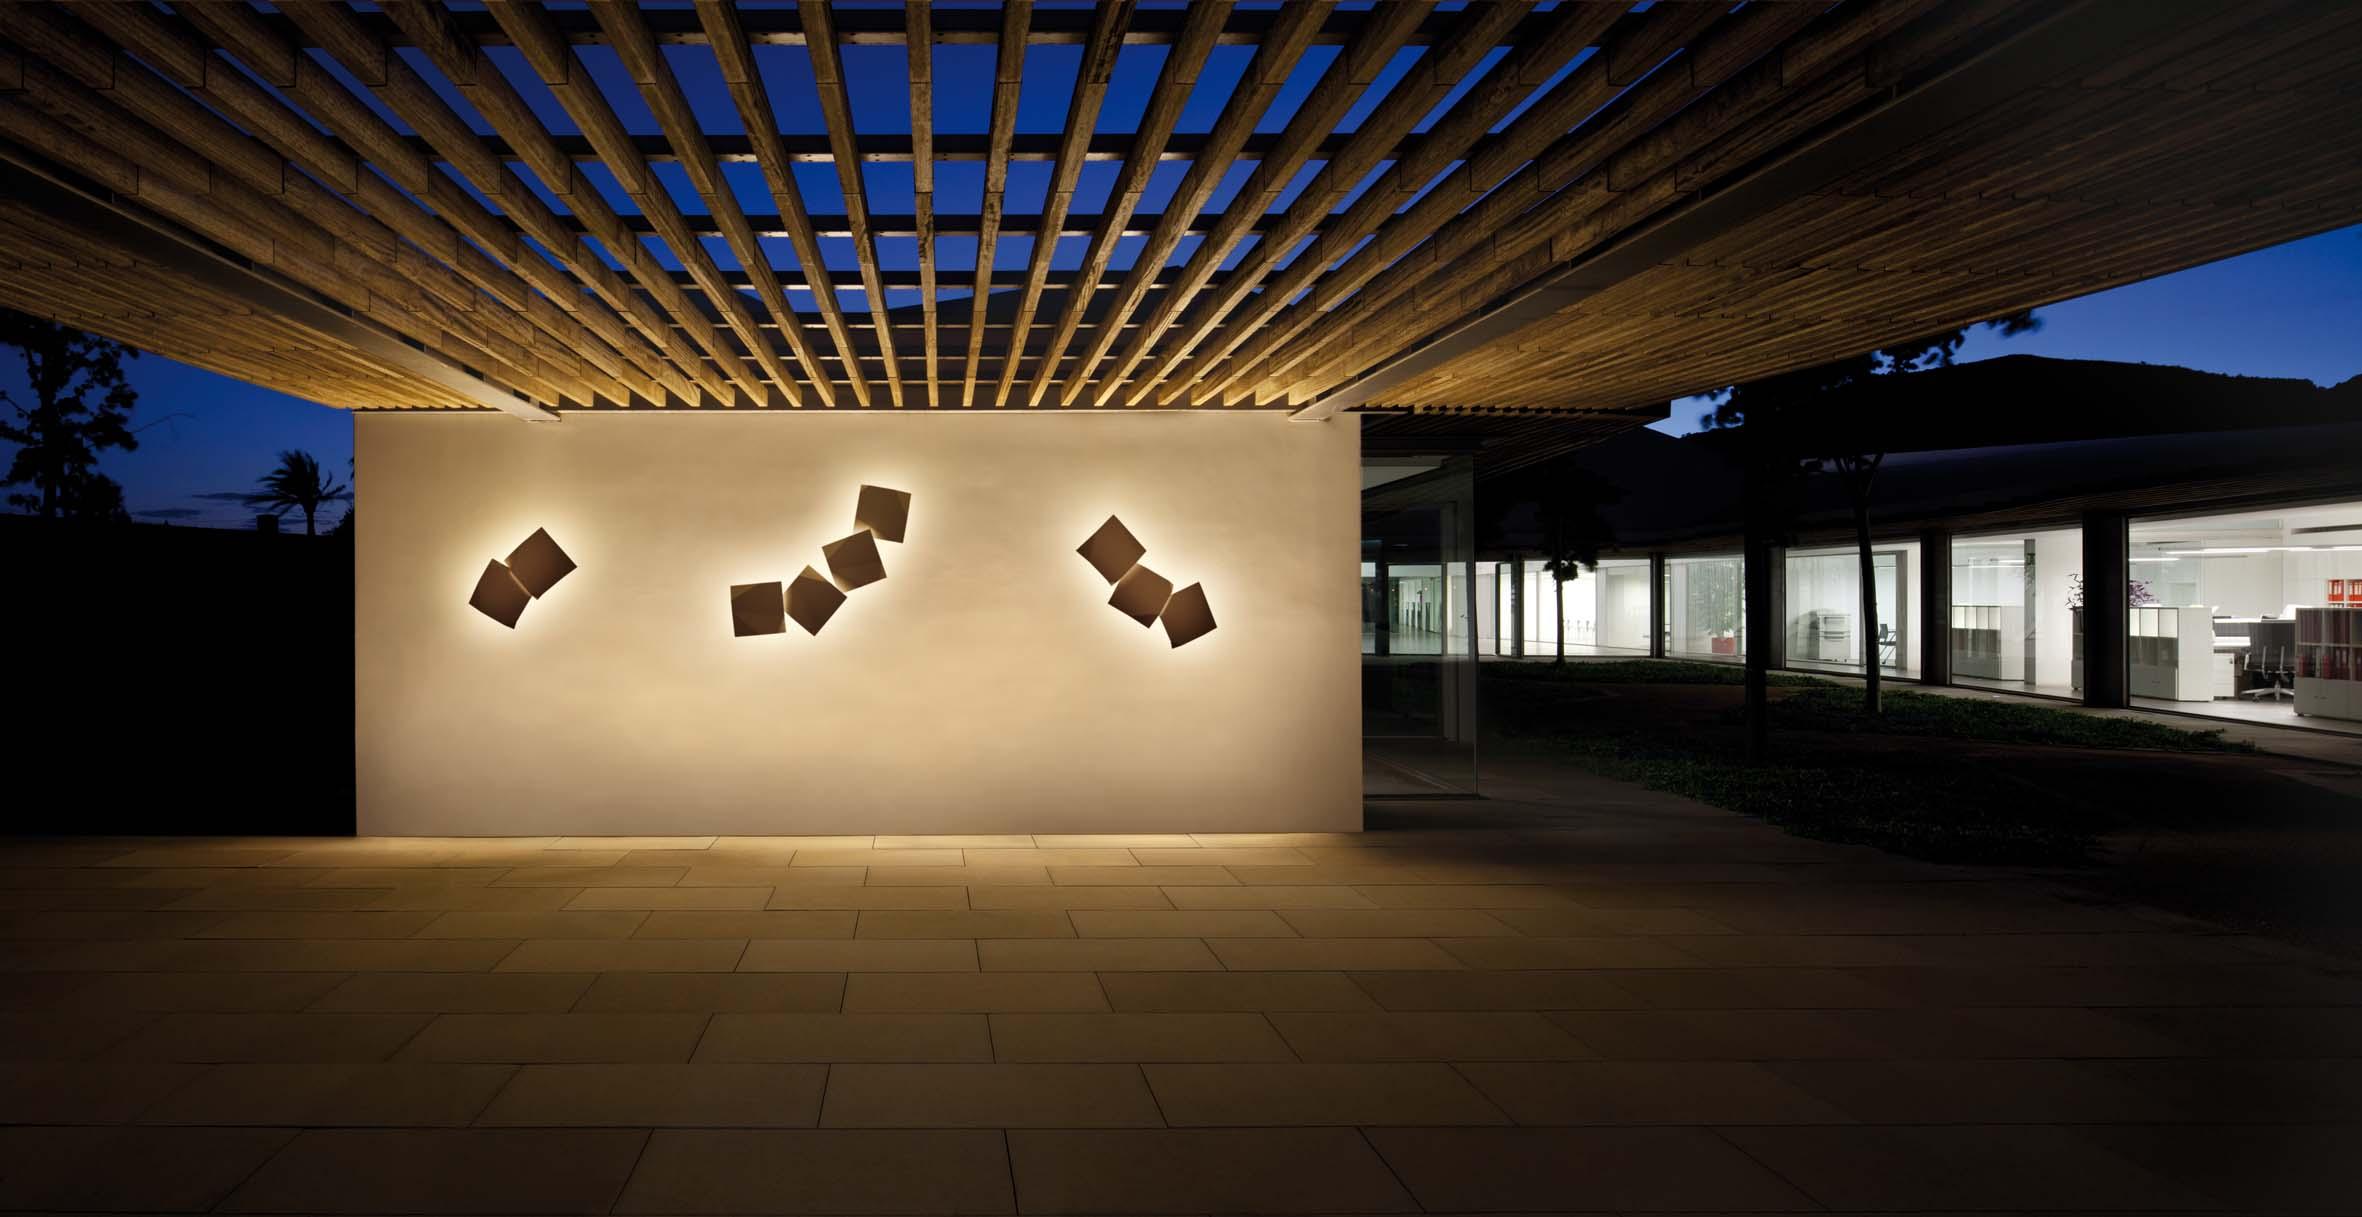 Iluminaci n de dise o decorativa y moderna gunni trentino - Iluminacion de exterior ...